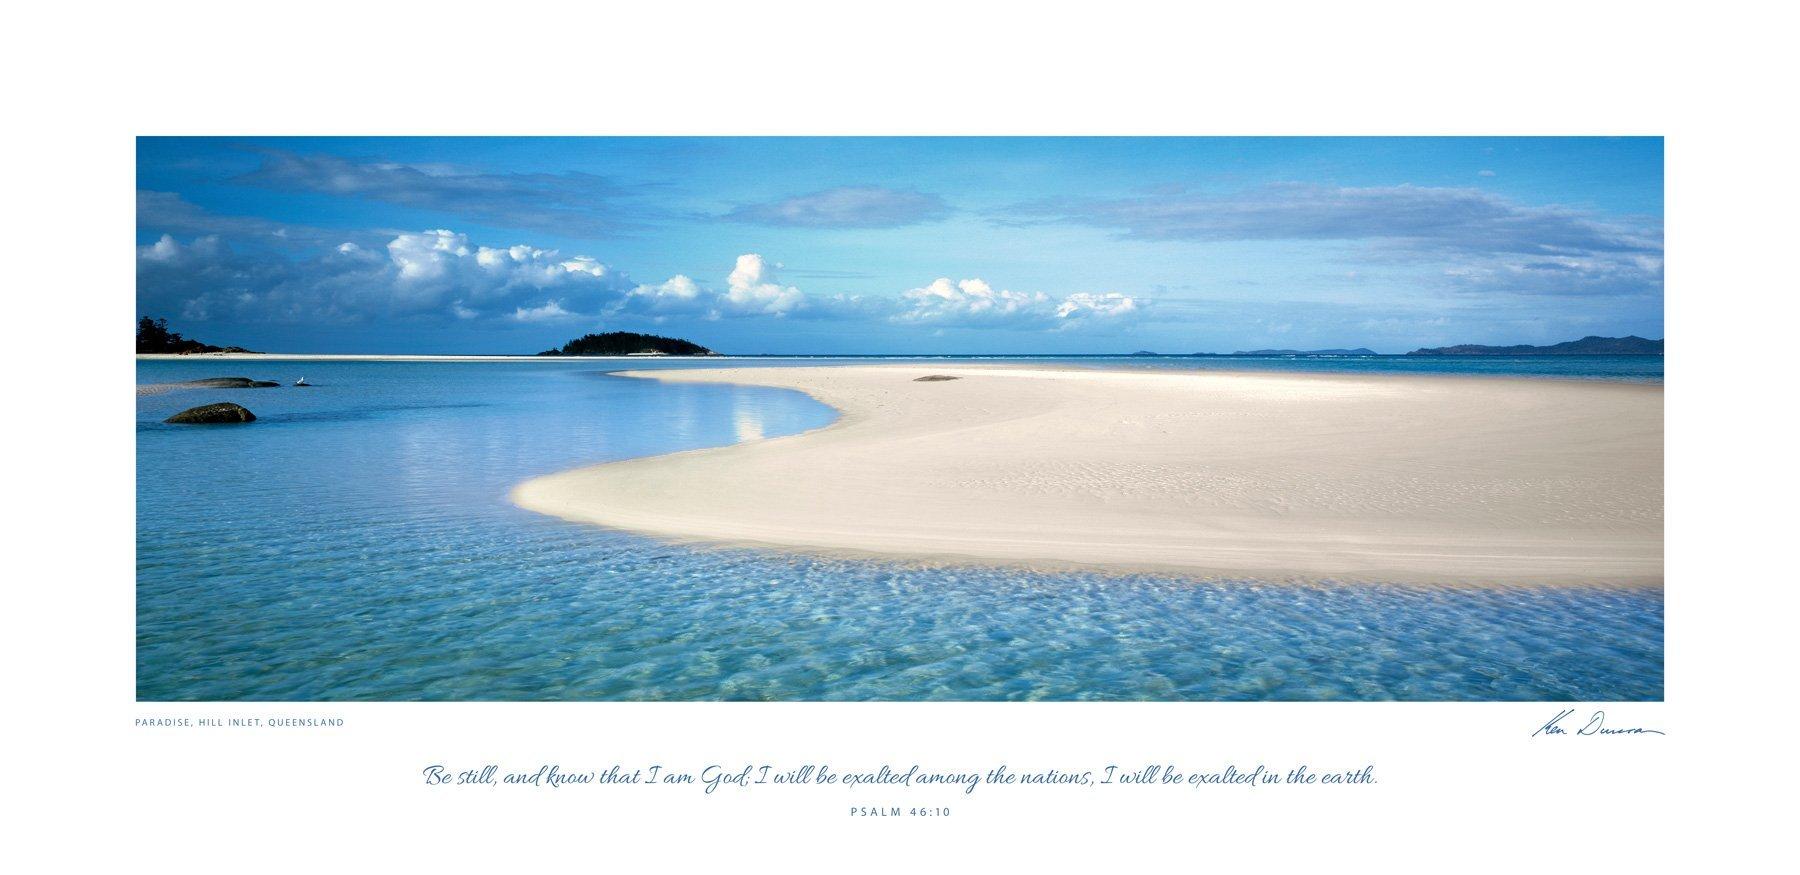 Paradise, Hill Inlet, Queensland (Bible Verse)